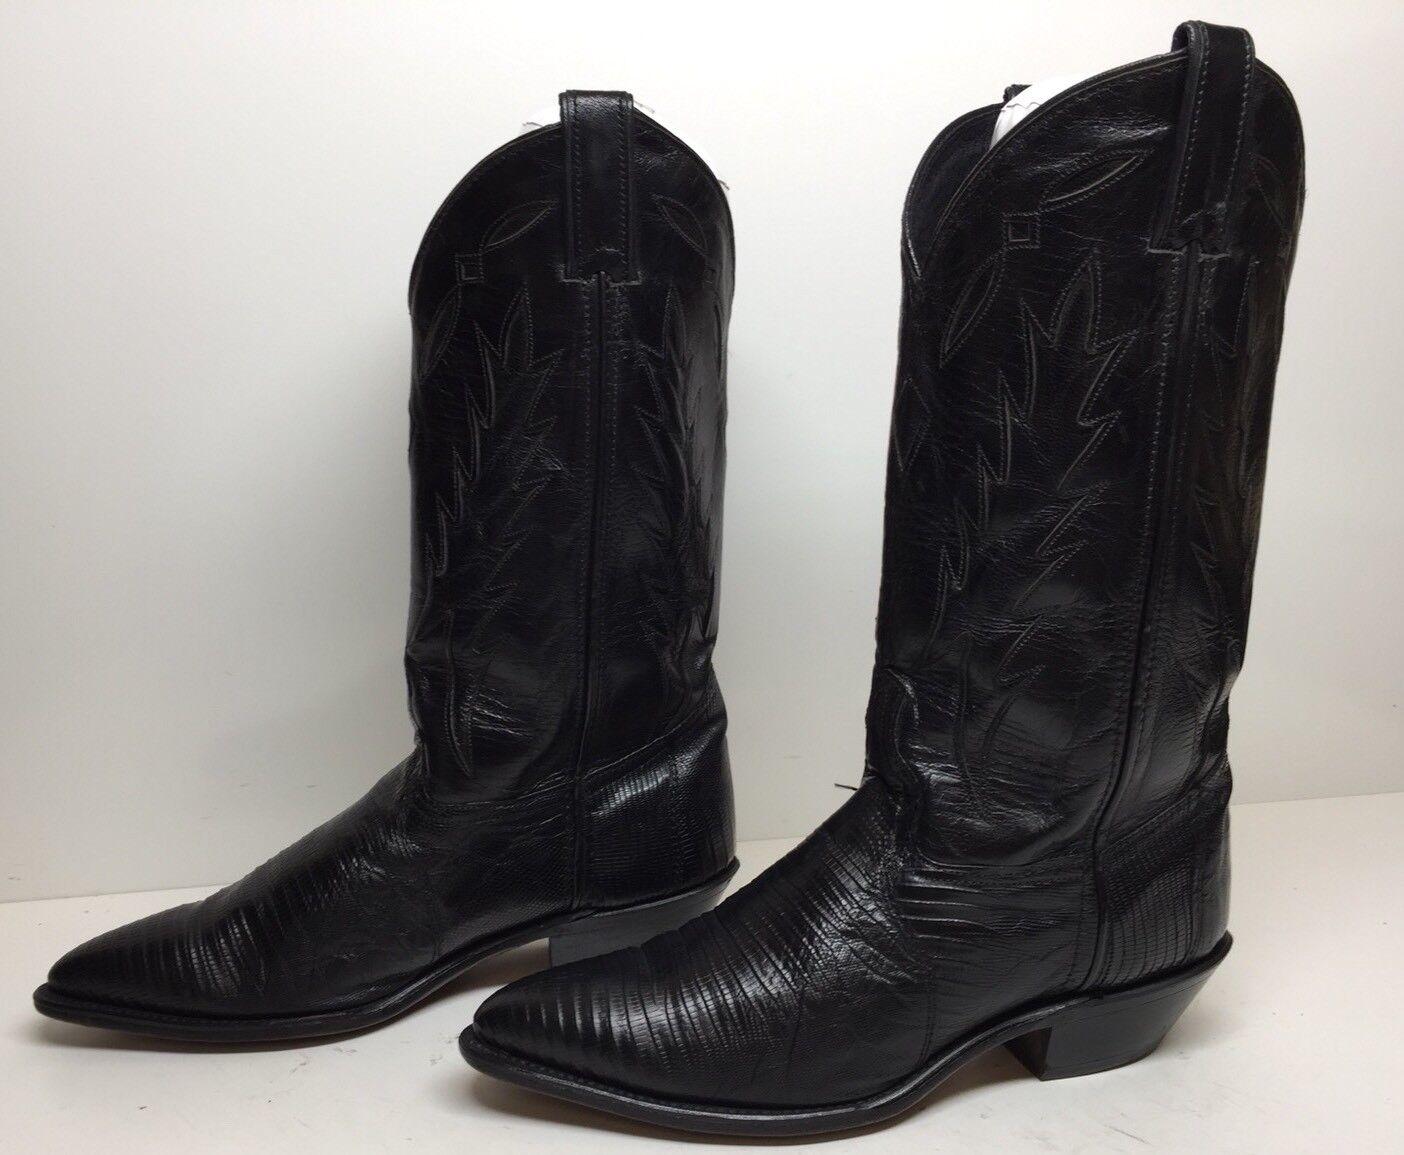 #L Damenschuhe CODE WEST COWBOY LIZARD SKIN INLAY LEATHER BLACK BOOTS SIZE 7 M